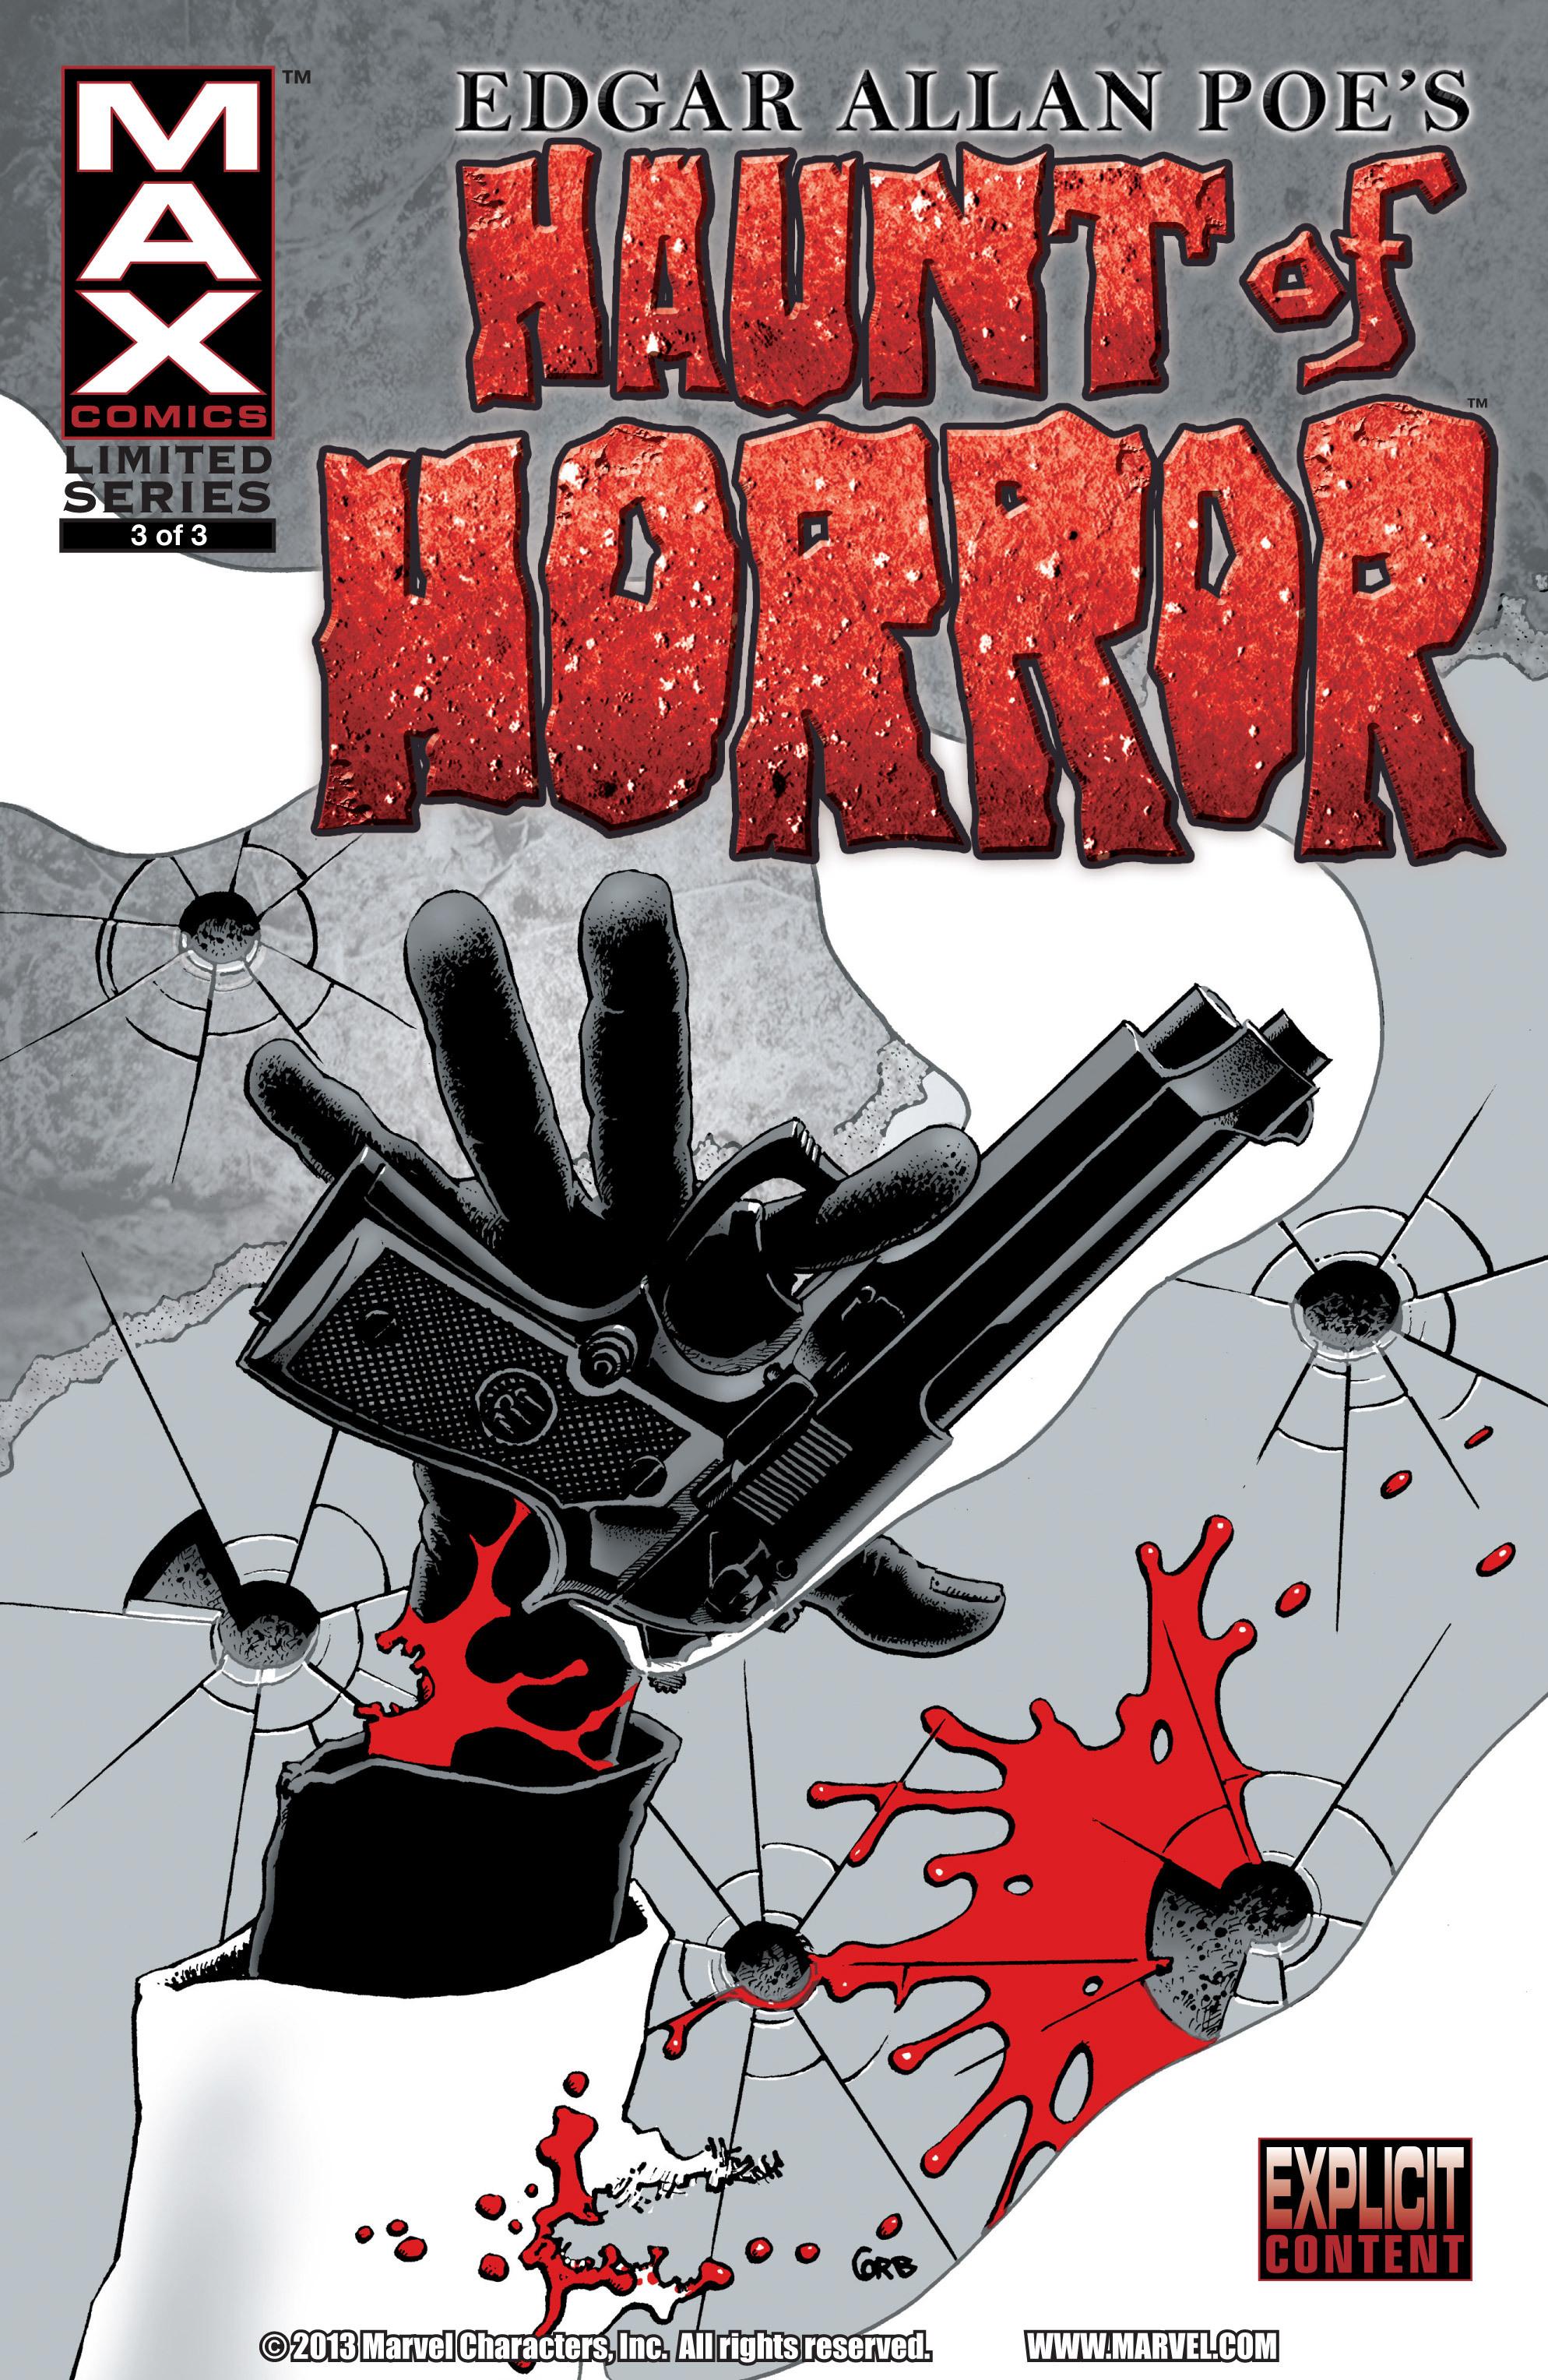 Read online Haunt of Horror: Edgar Allan Poe comic -  Issue #3 - 1